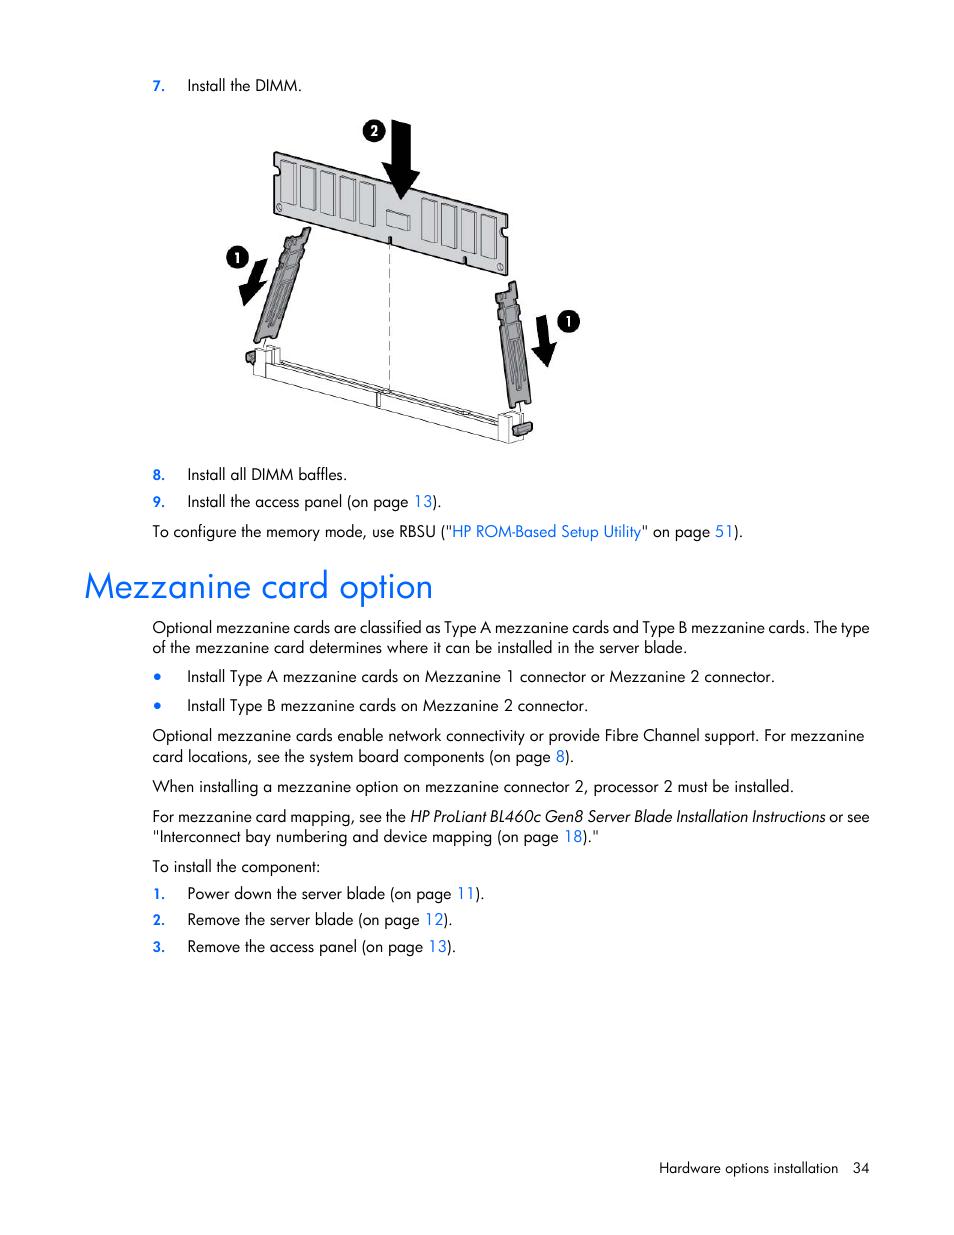 Mezzanine card option | hp proliant bl460c gen8 server blade user.